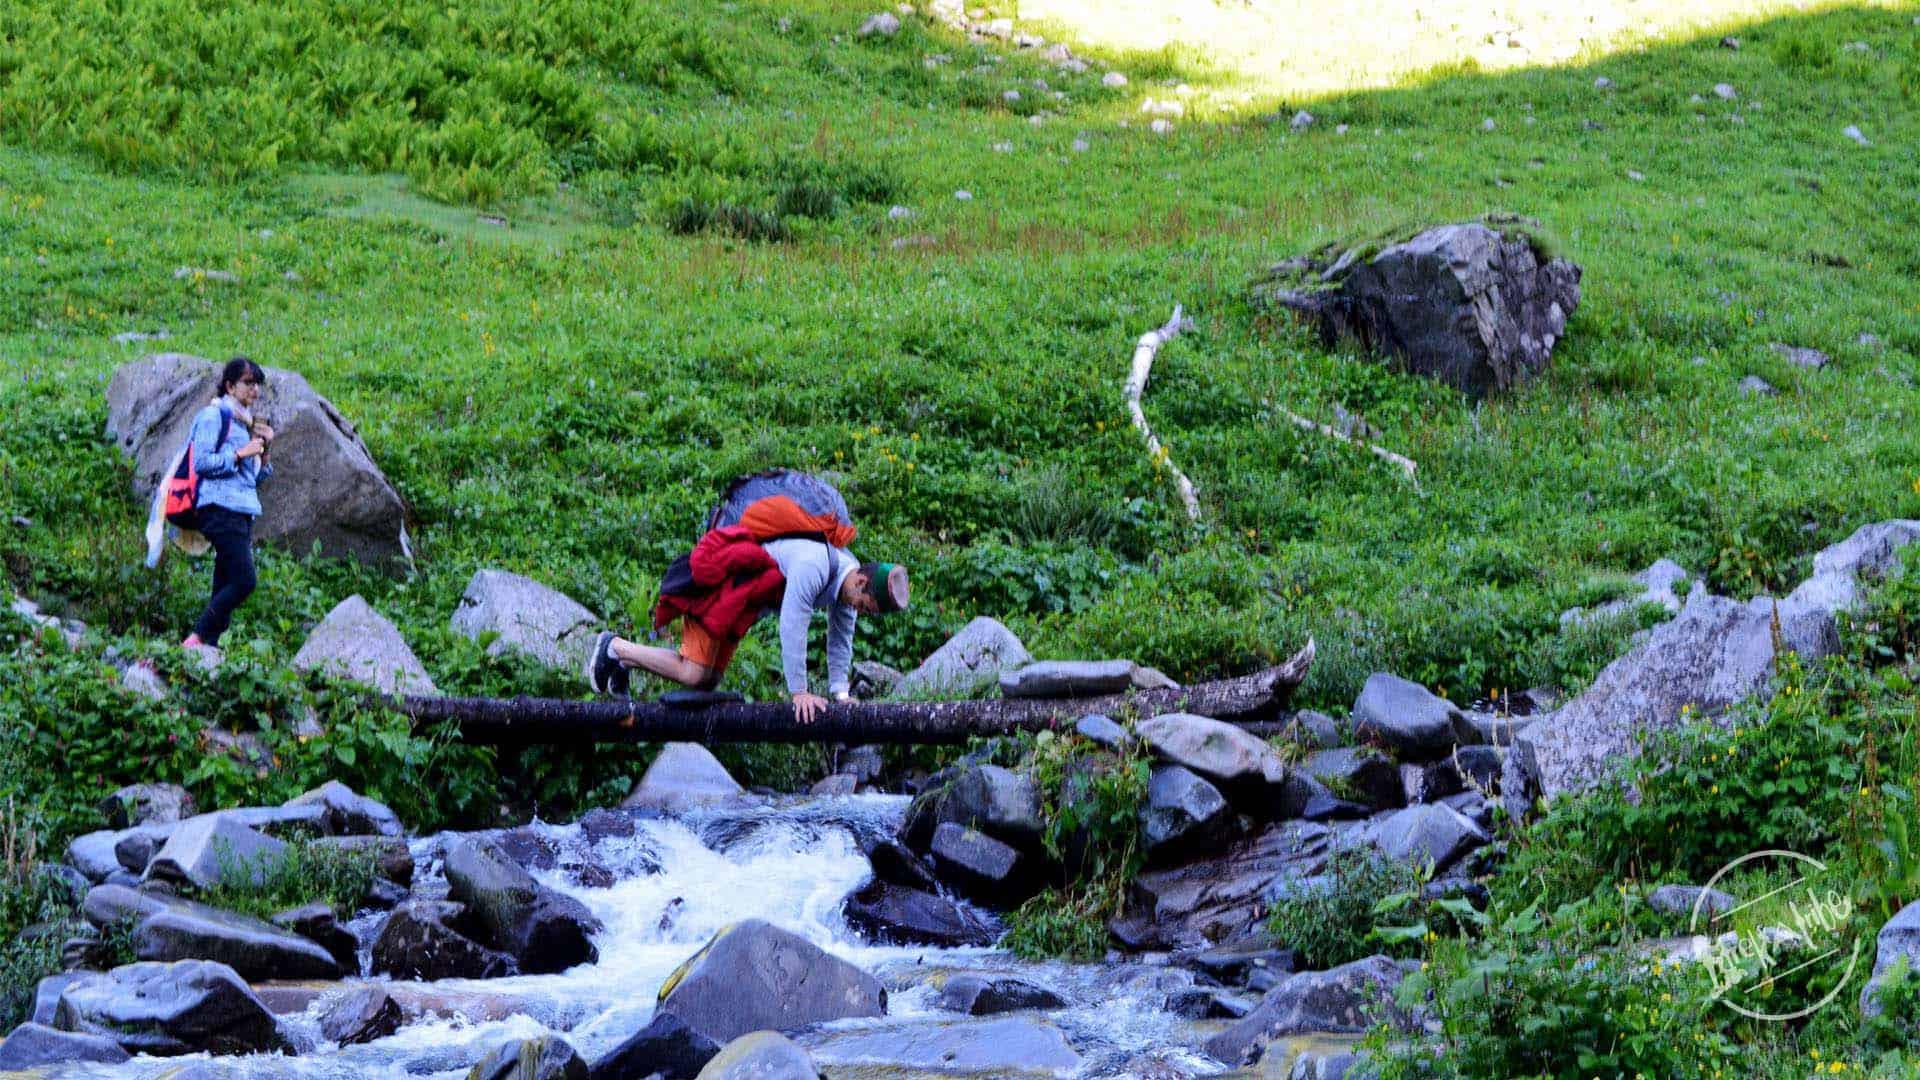 Chandernahan lake Trekking Pabbar valley - Rohru , Shimla , Himachal Pradesh